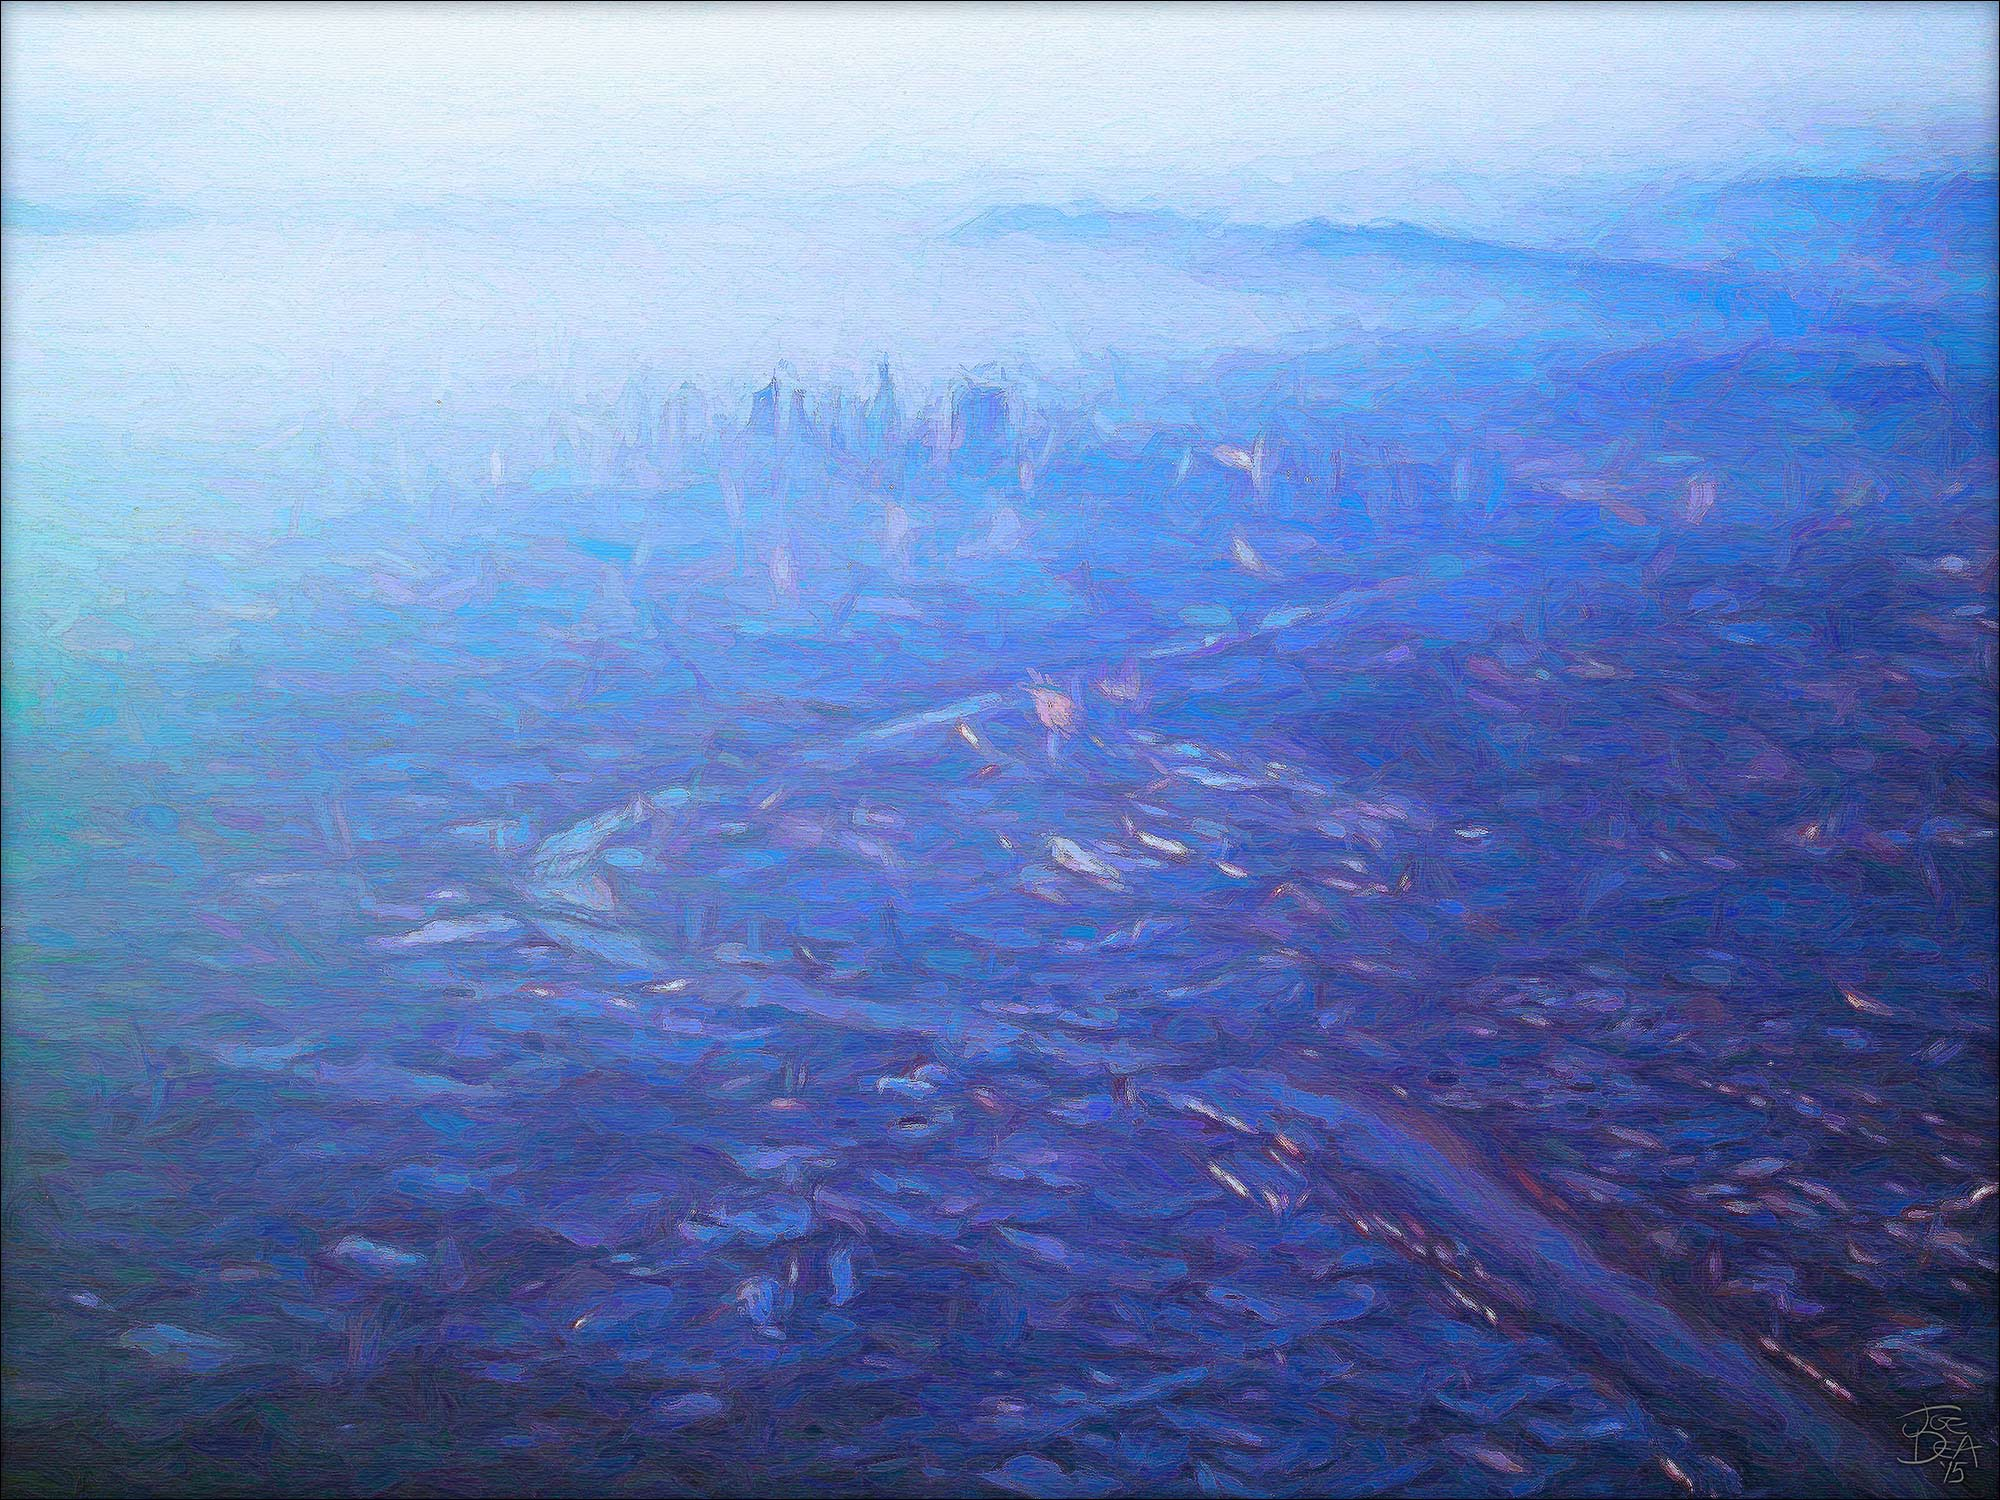 Los Angeles - Downtown / LA River